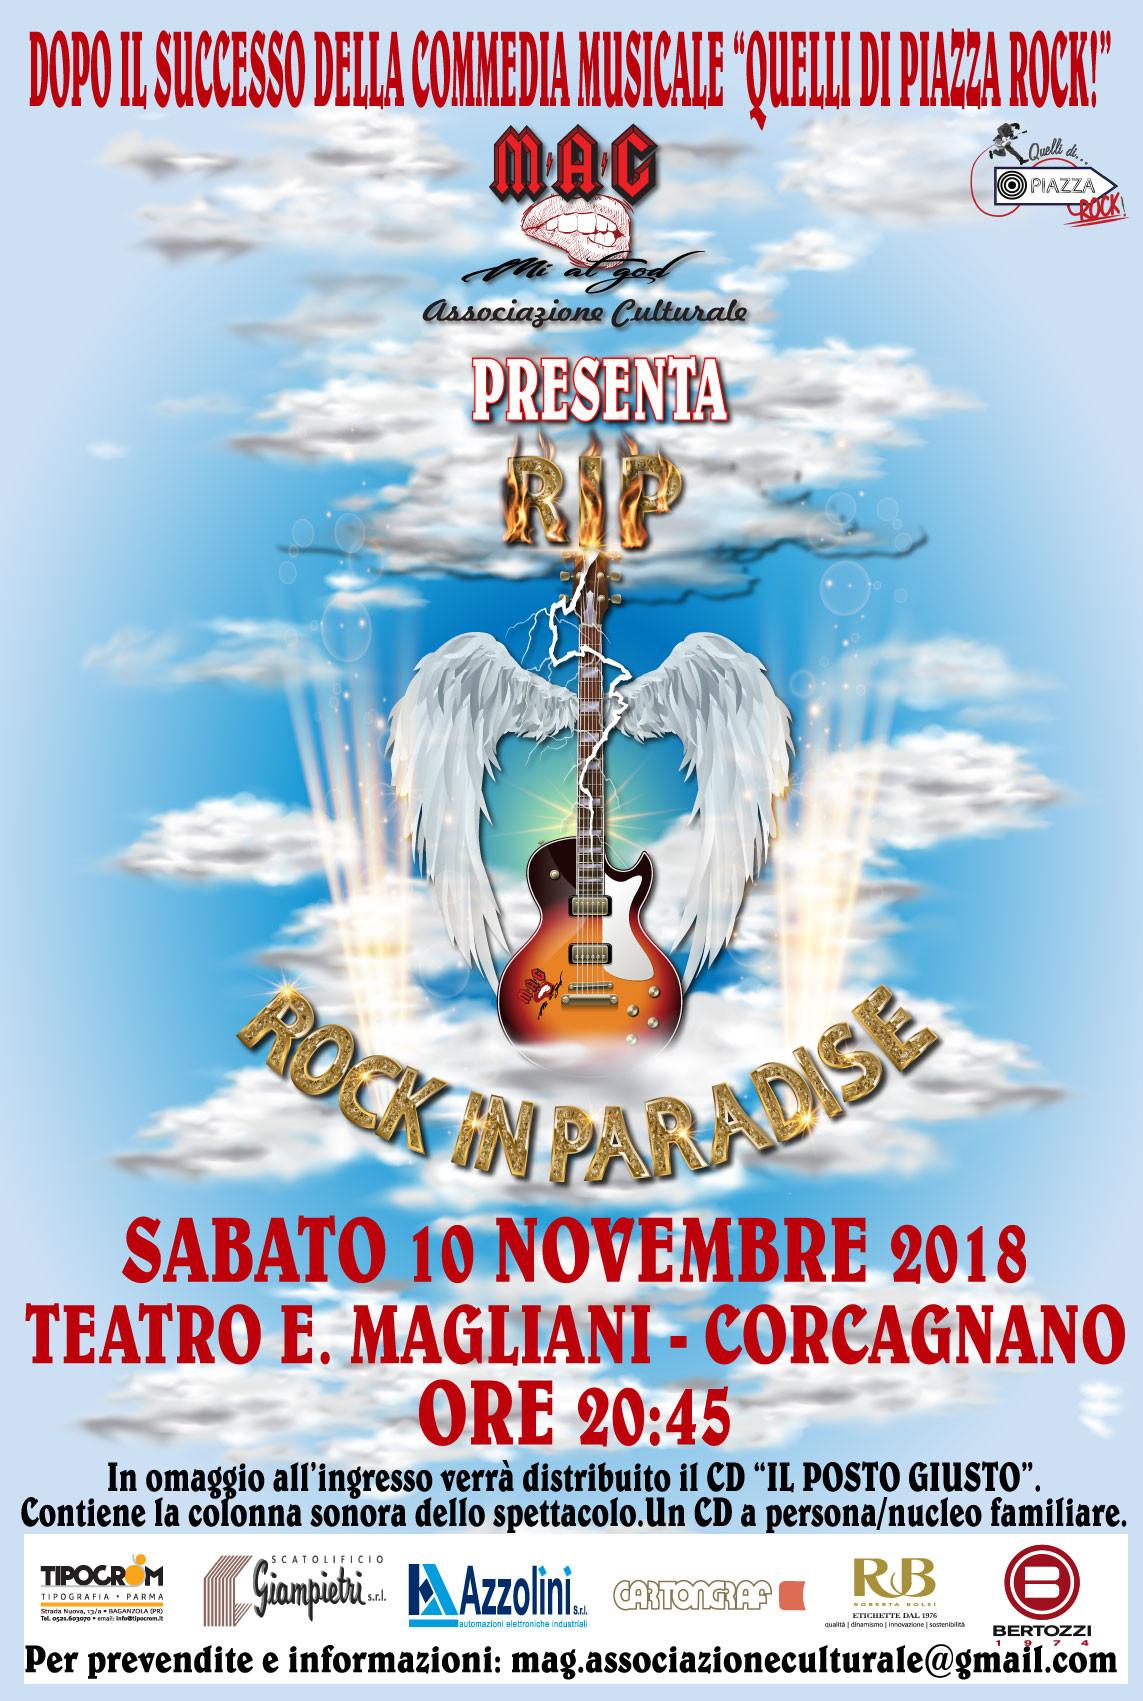 Rock in paradise al teatro Ennio Magliani